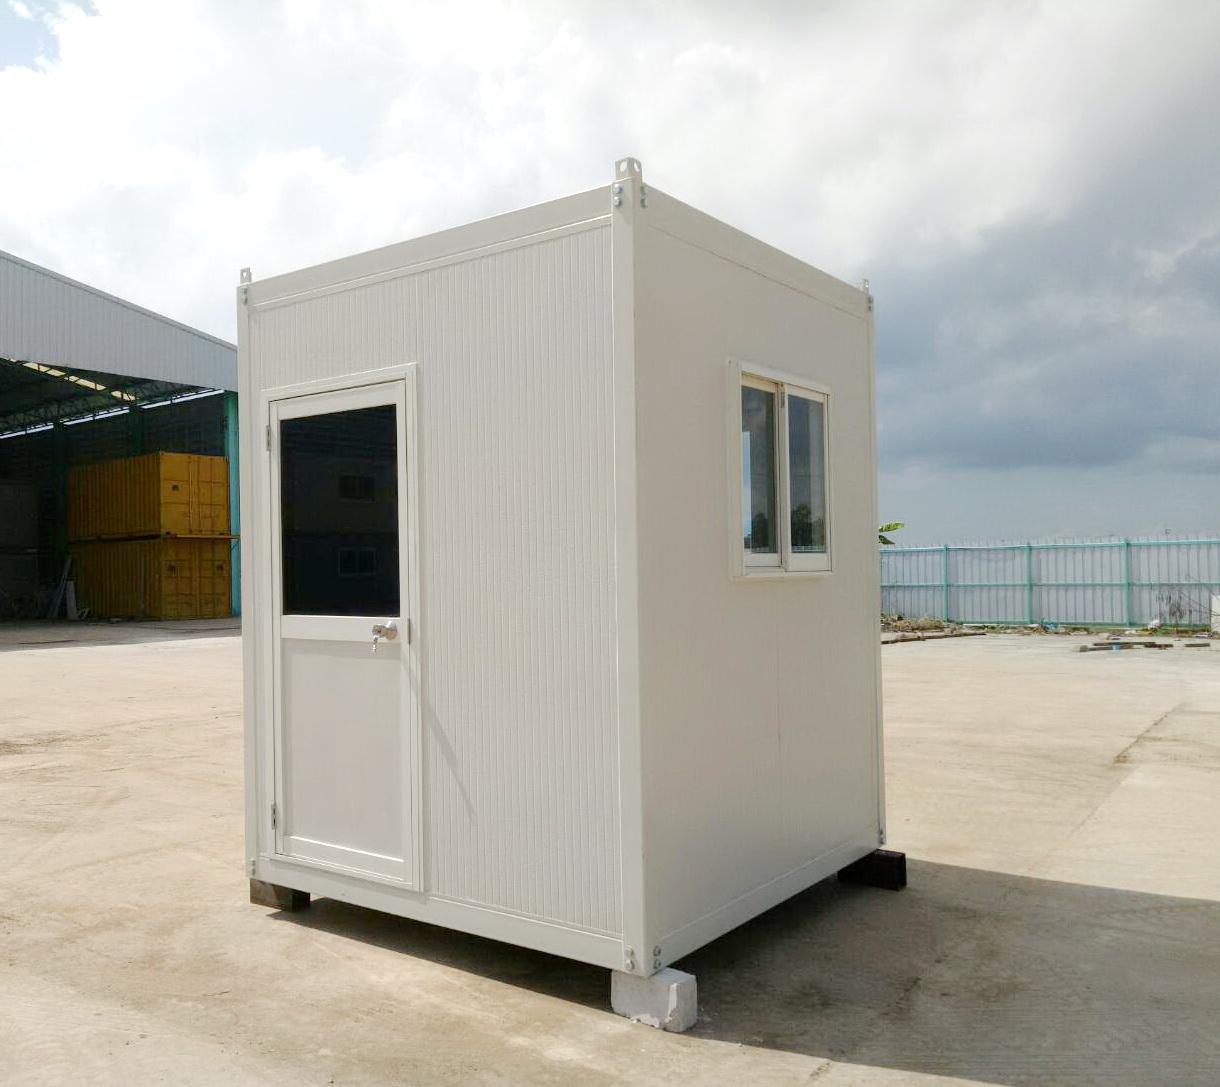 Guard box